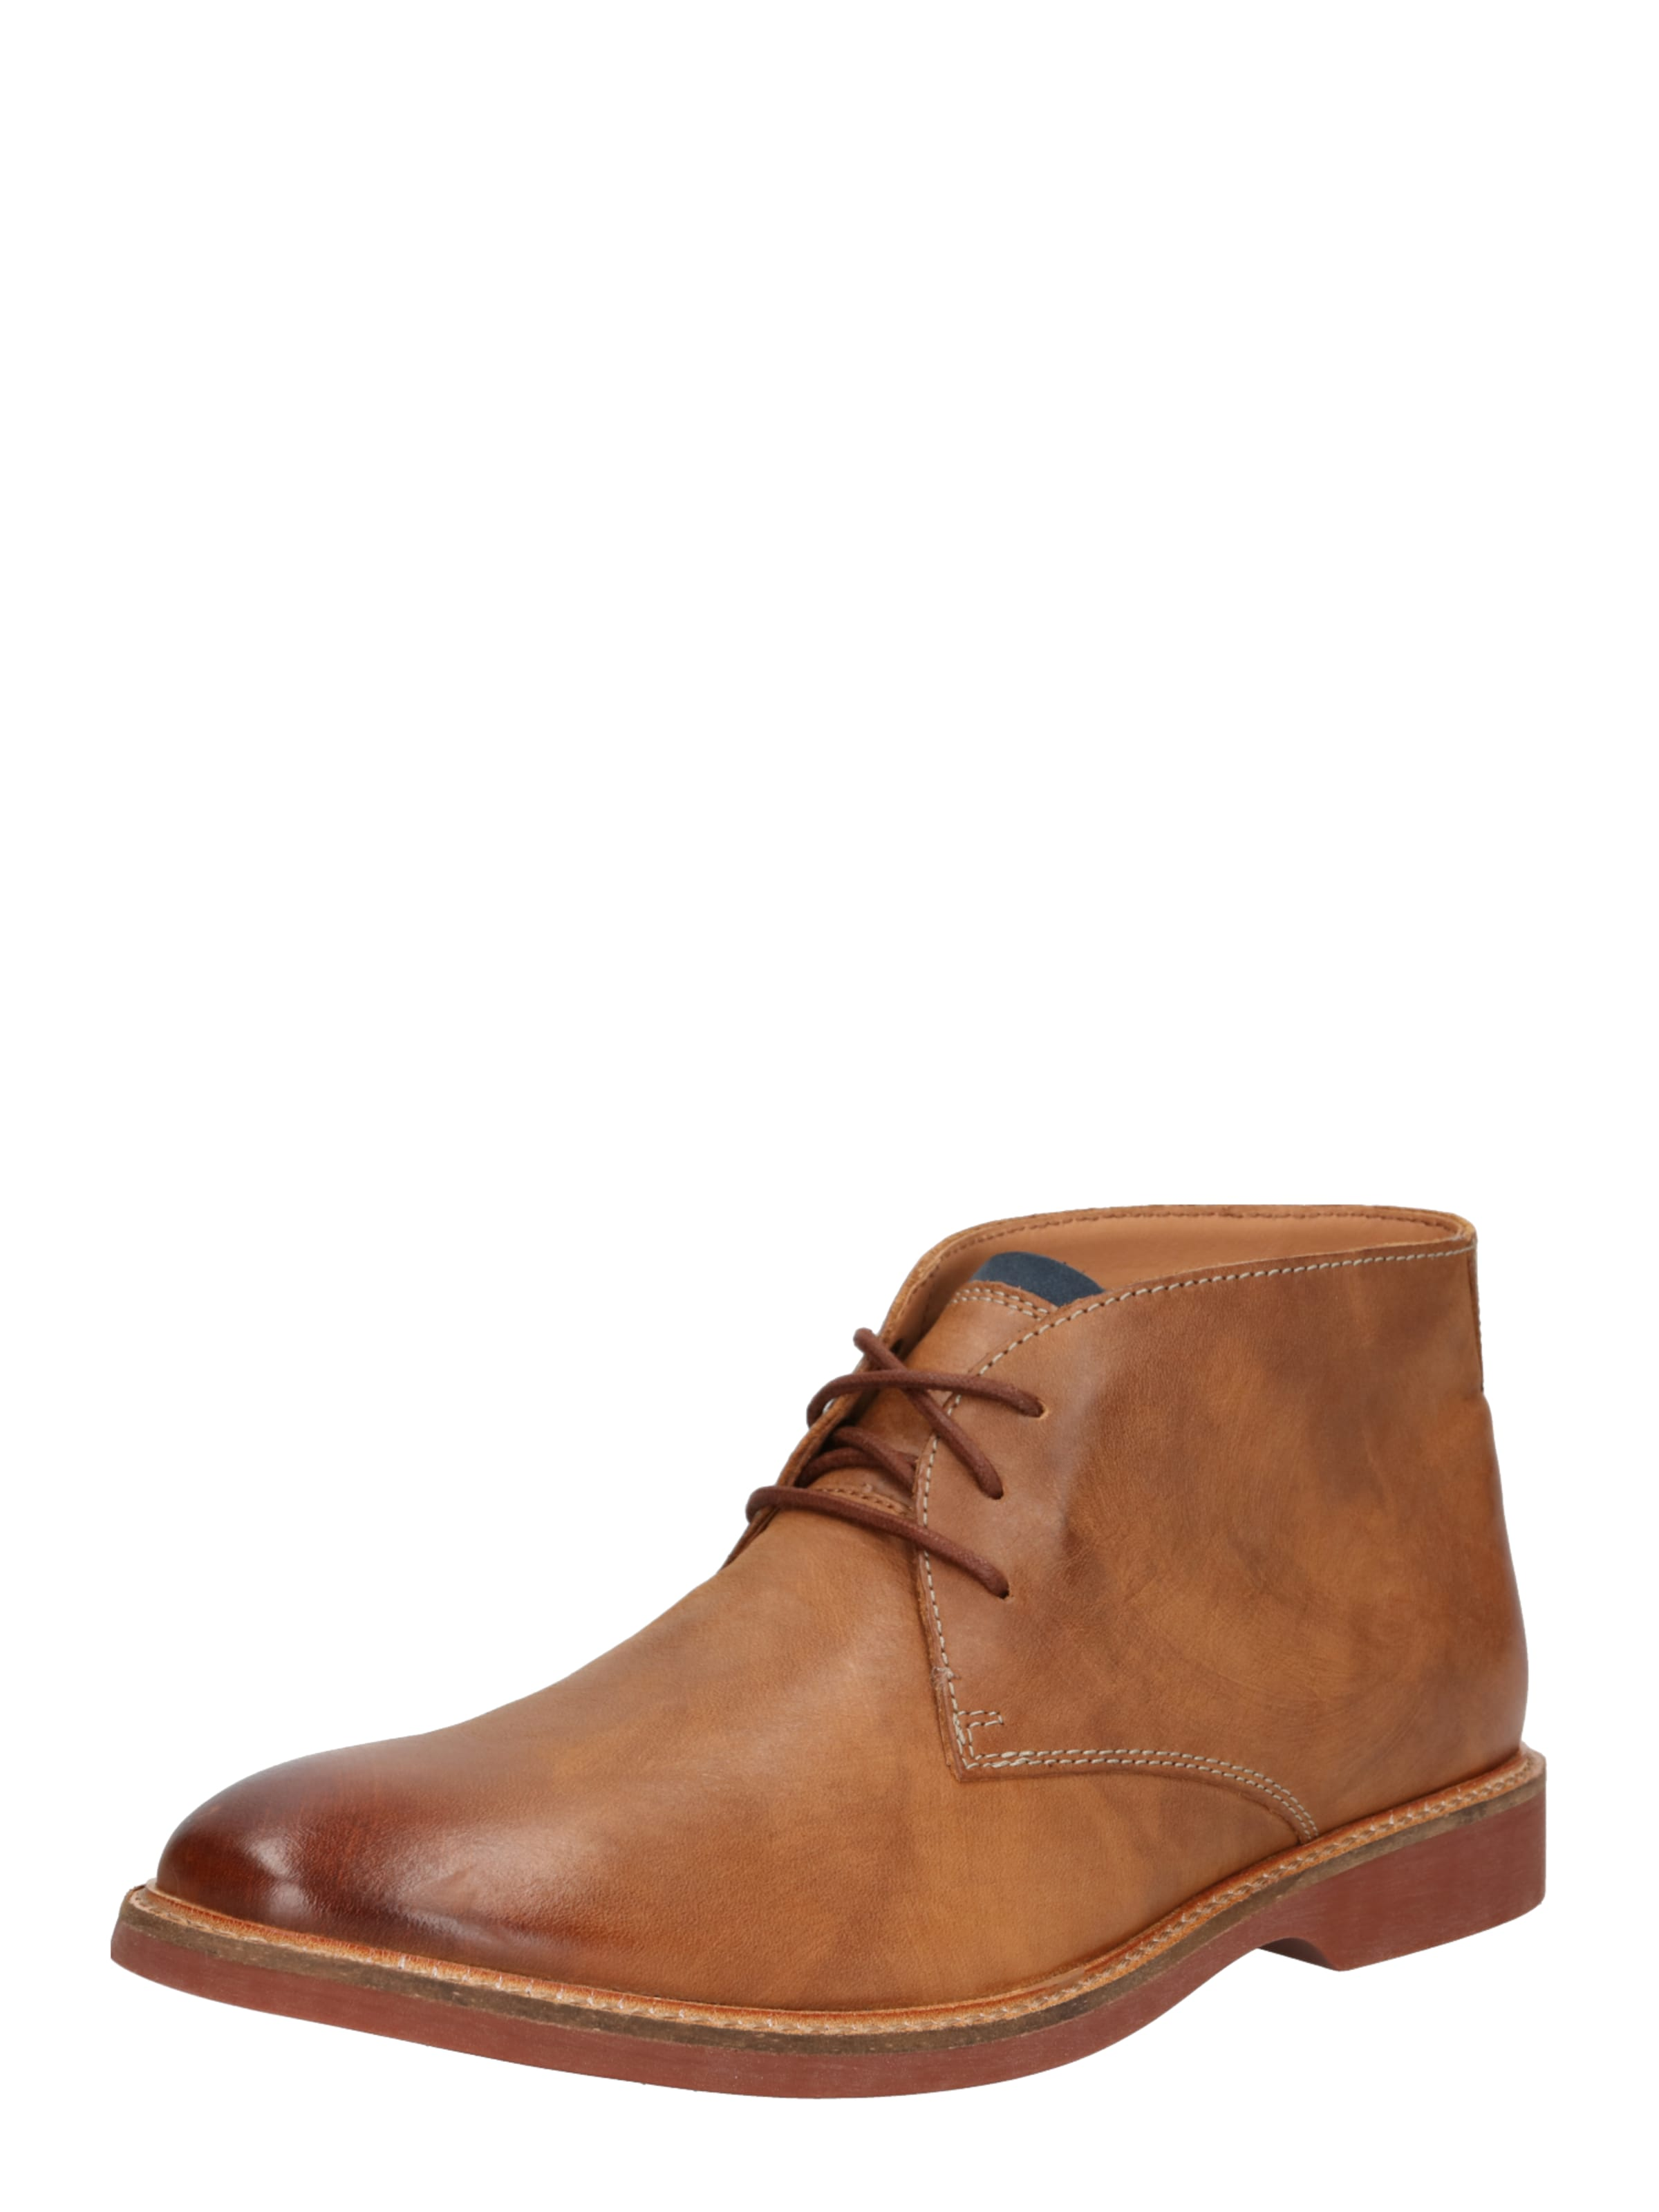 Limit' 'atticus Chukka Boots In Hellbraun Clarks qzMSpUGLV